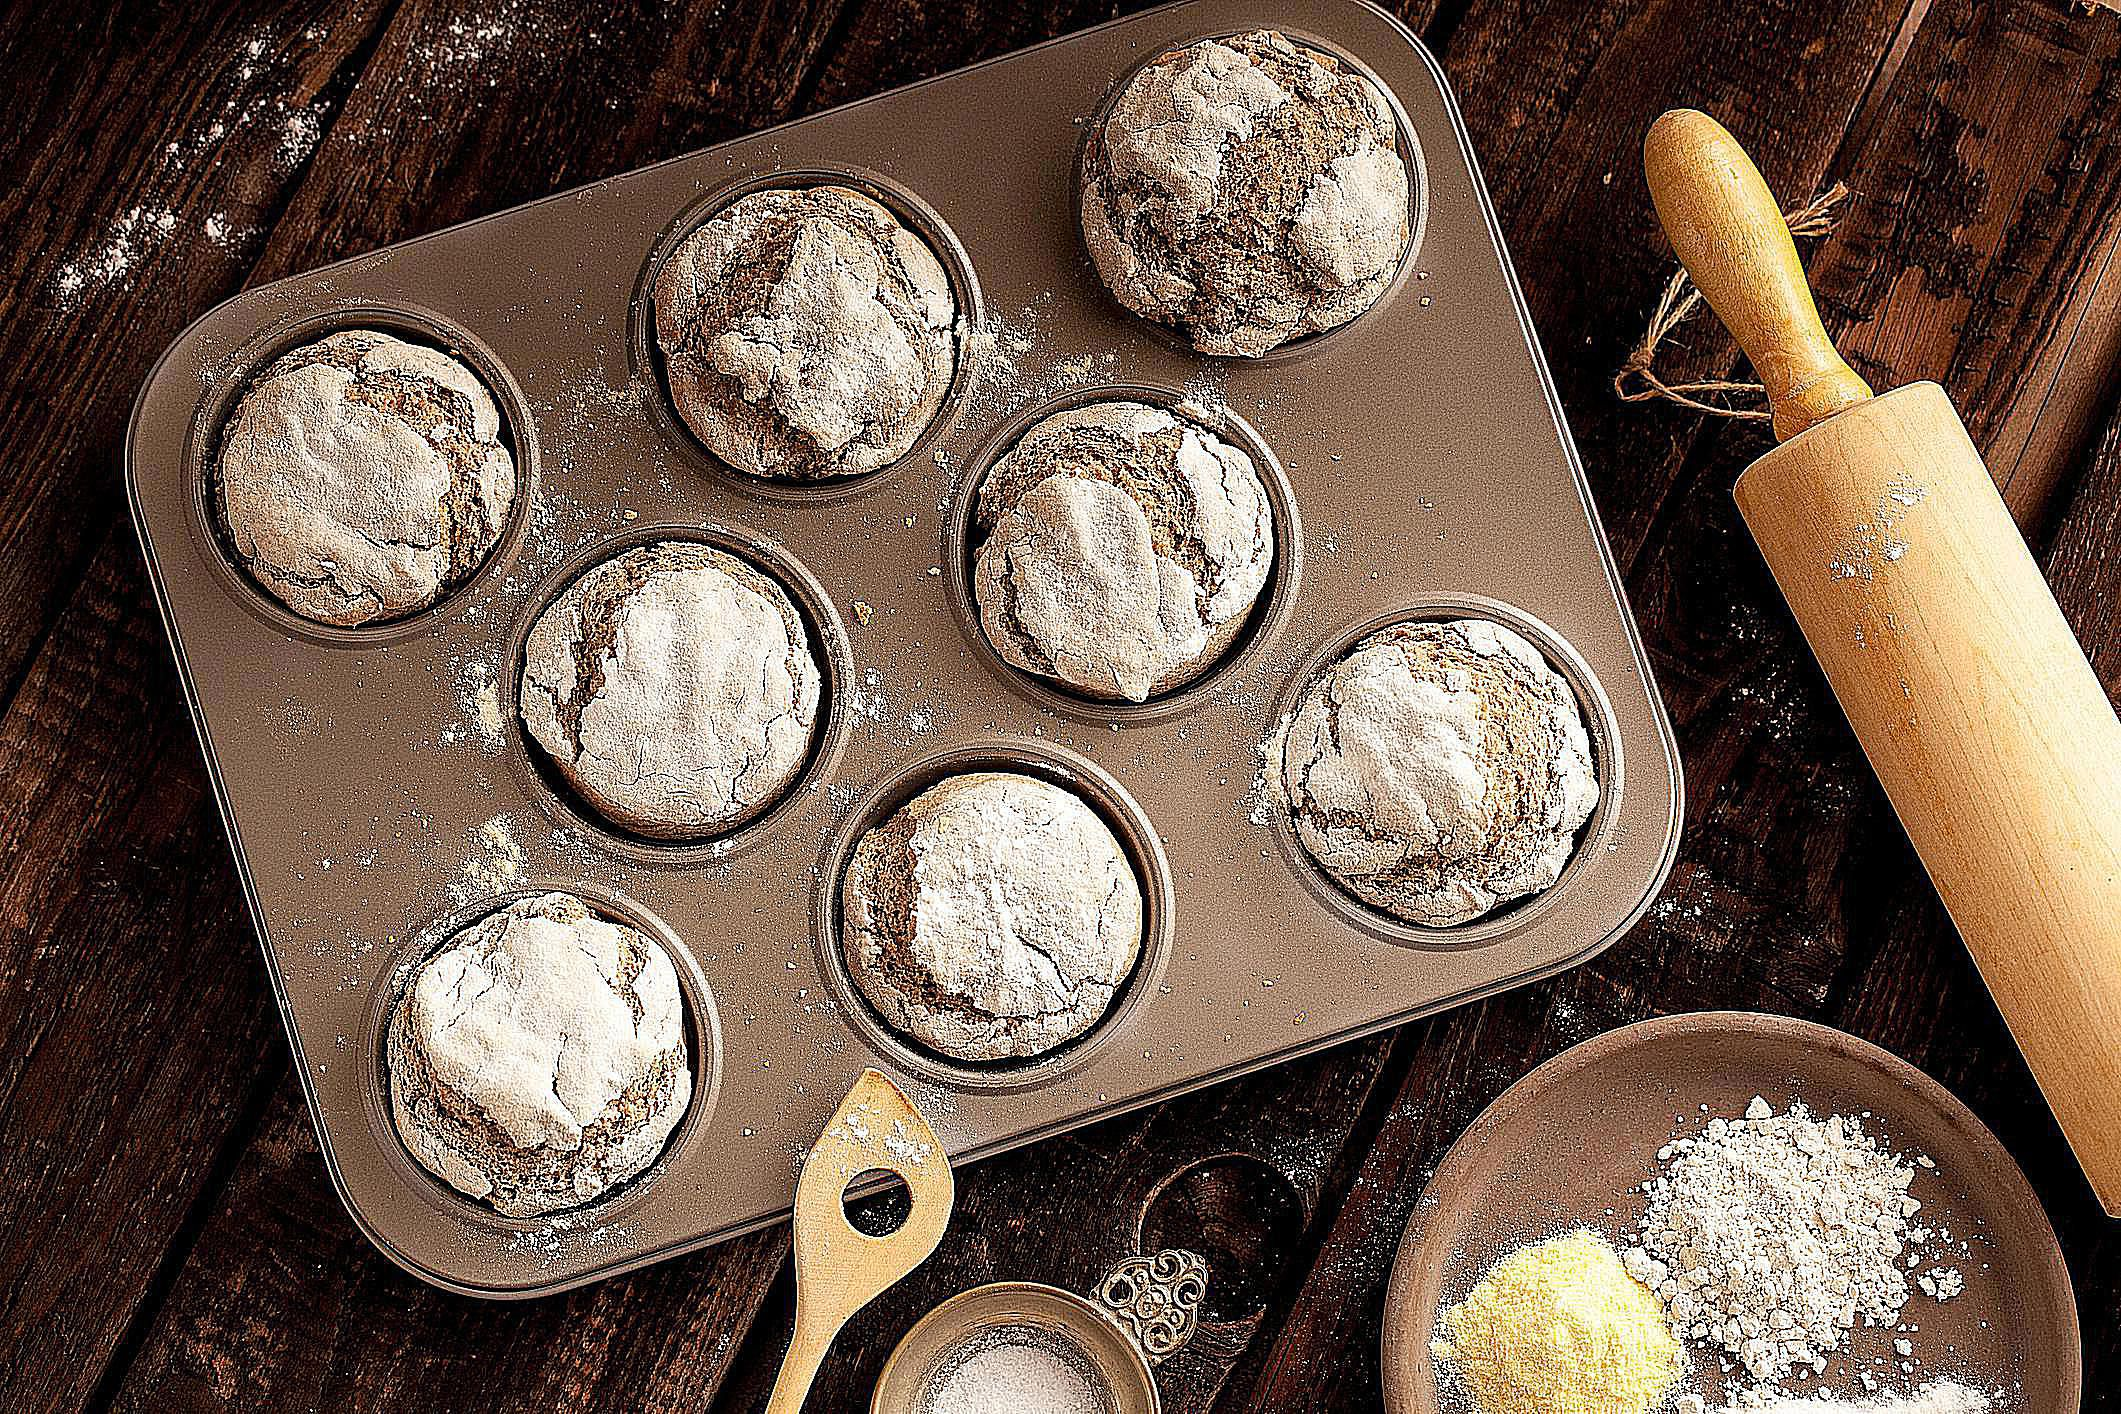 Cake Baking Pans Conversion Times (By Pan Size